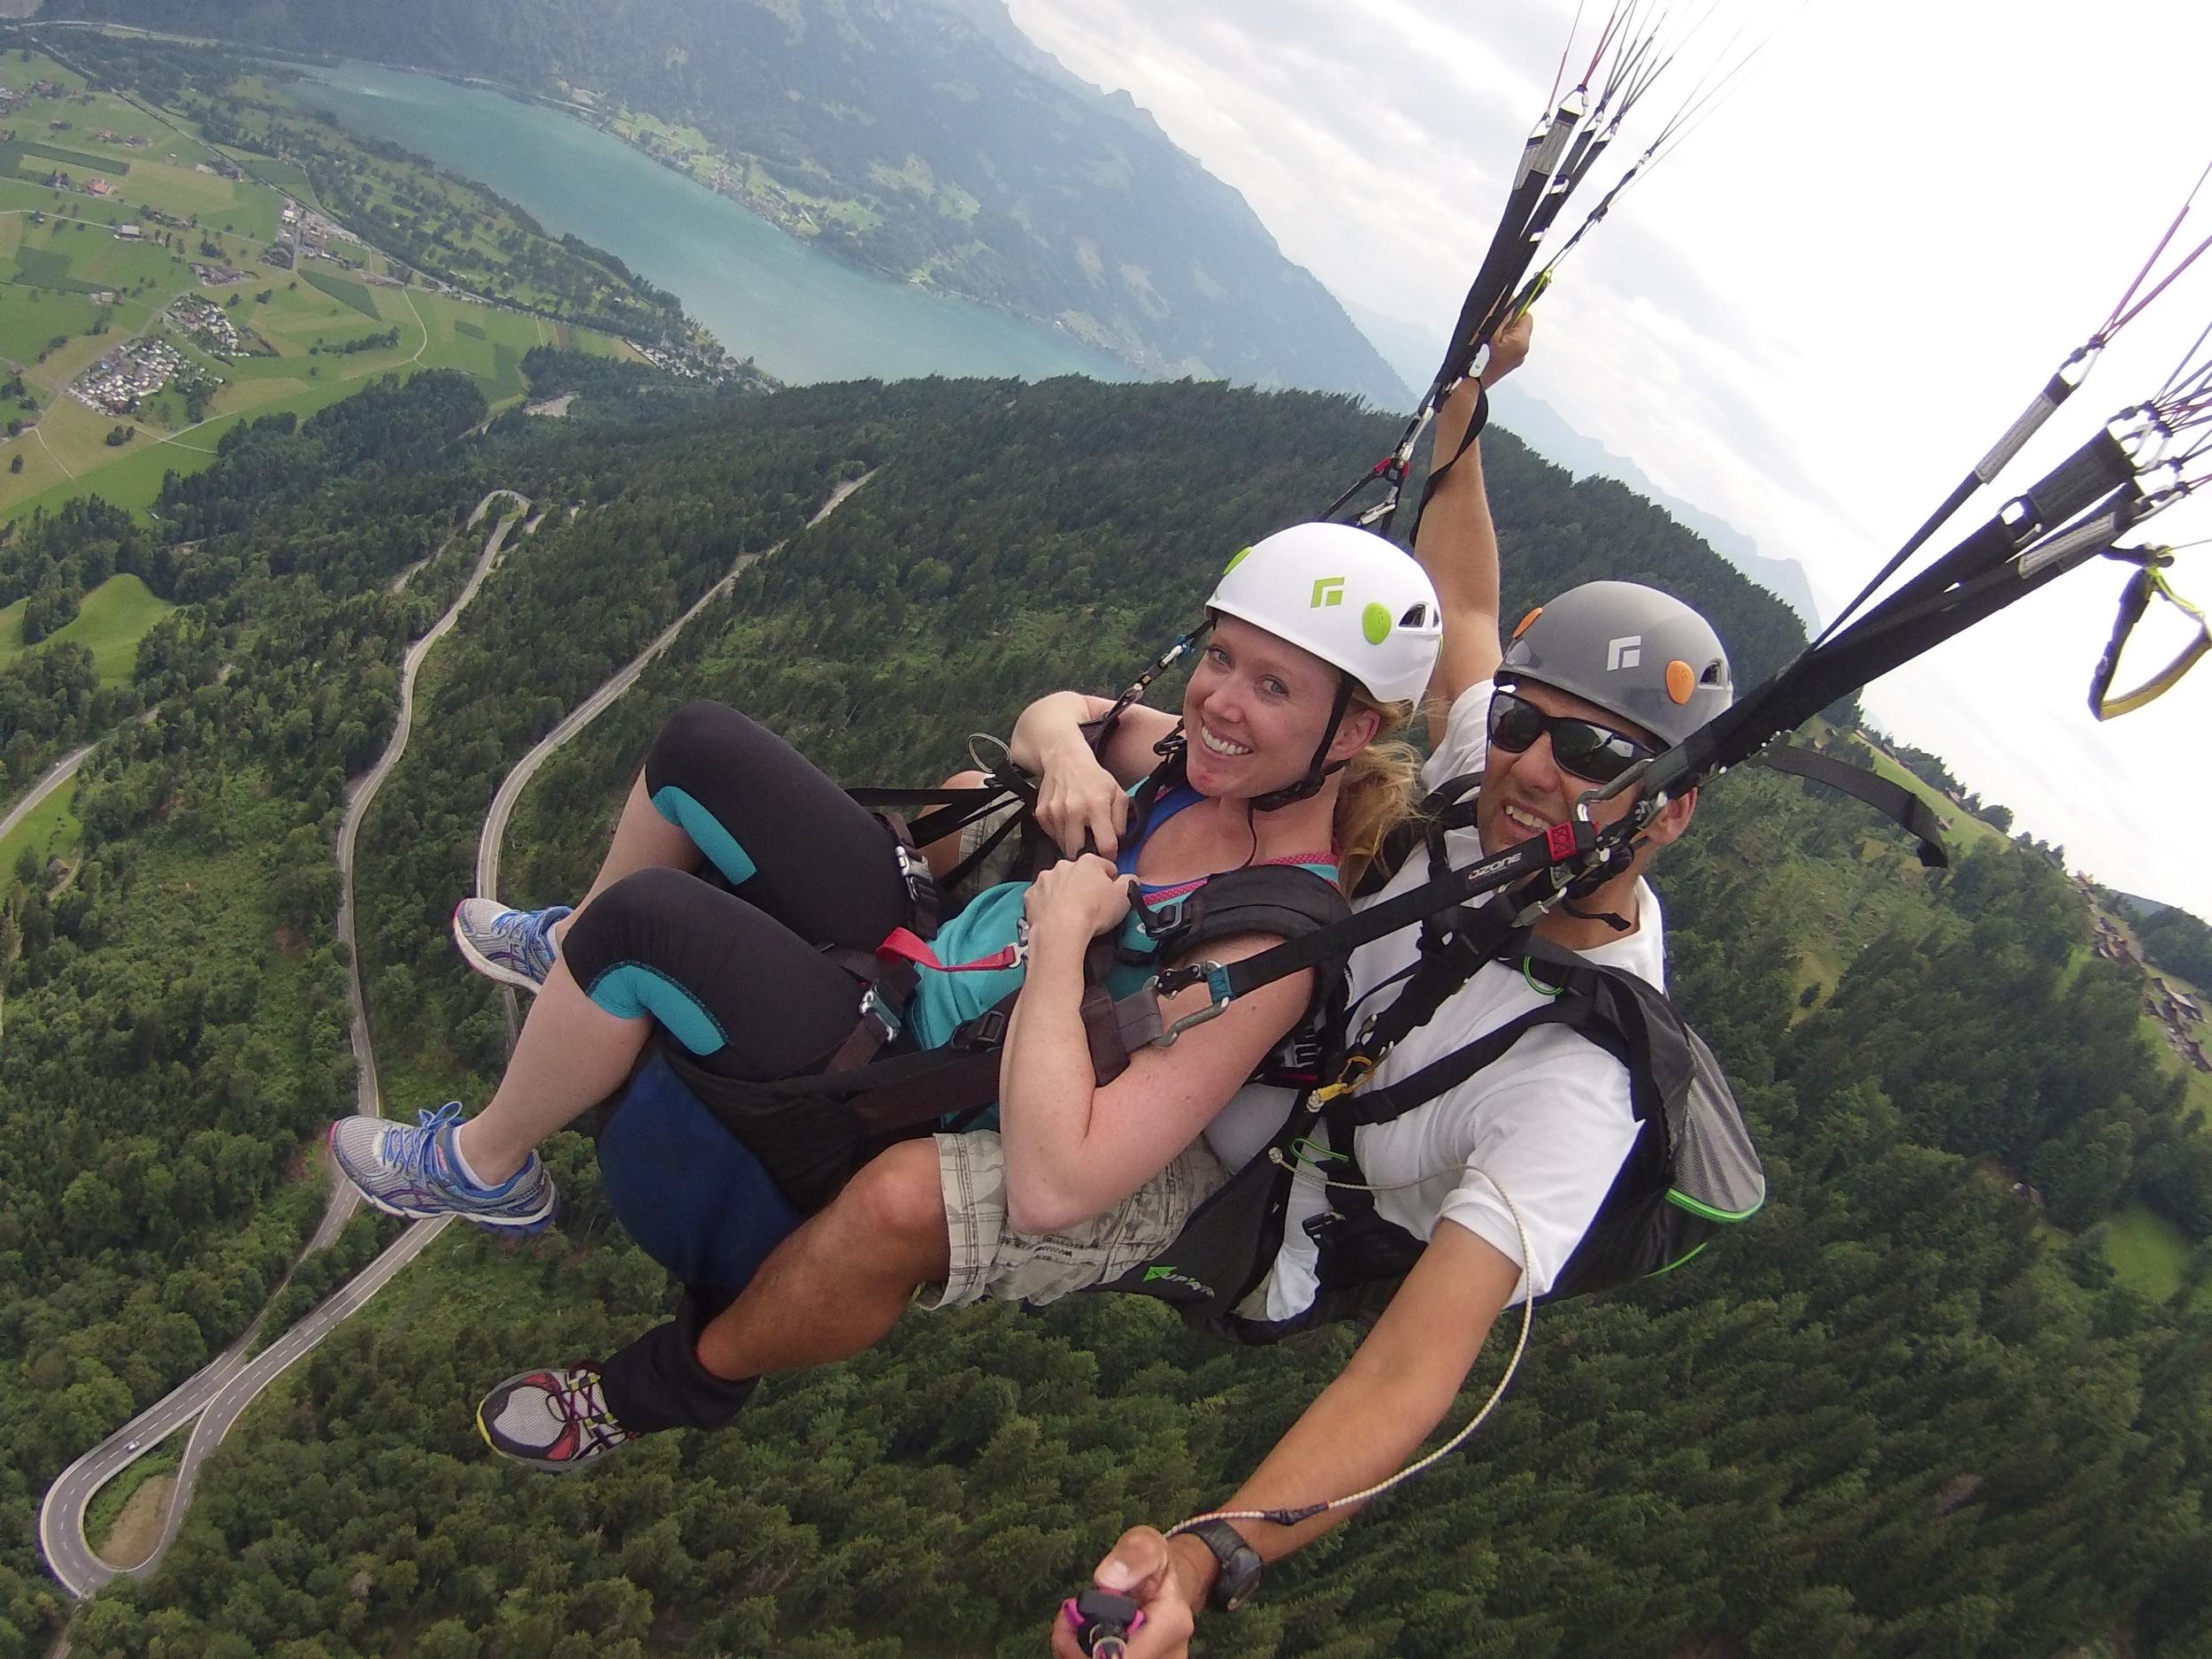 paraglidingininterlaken